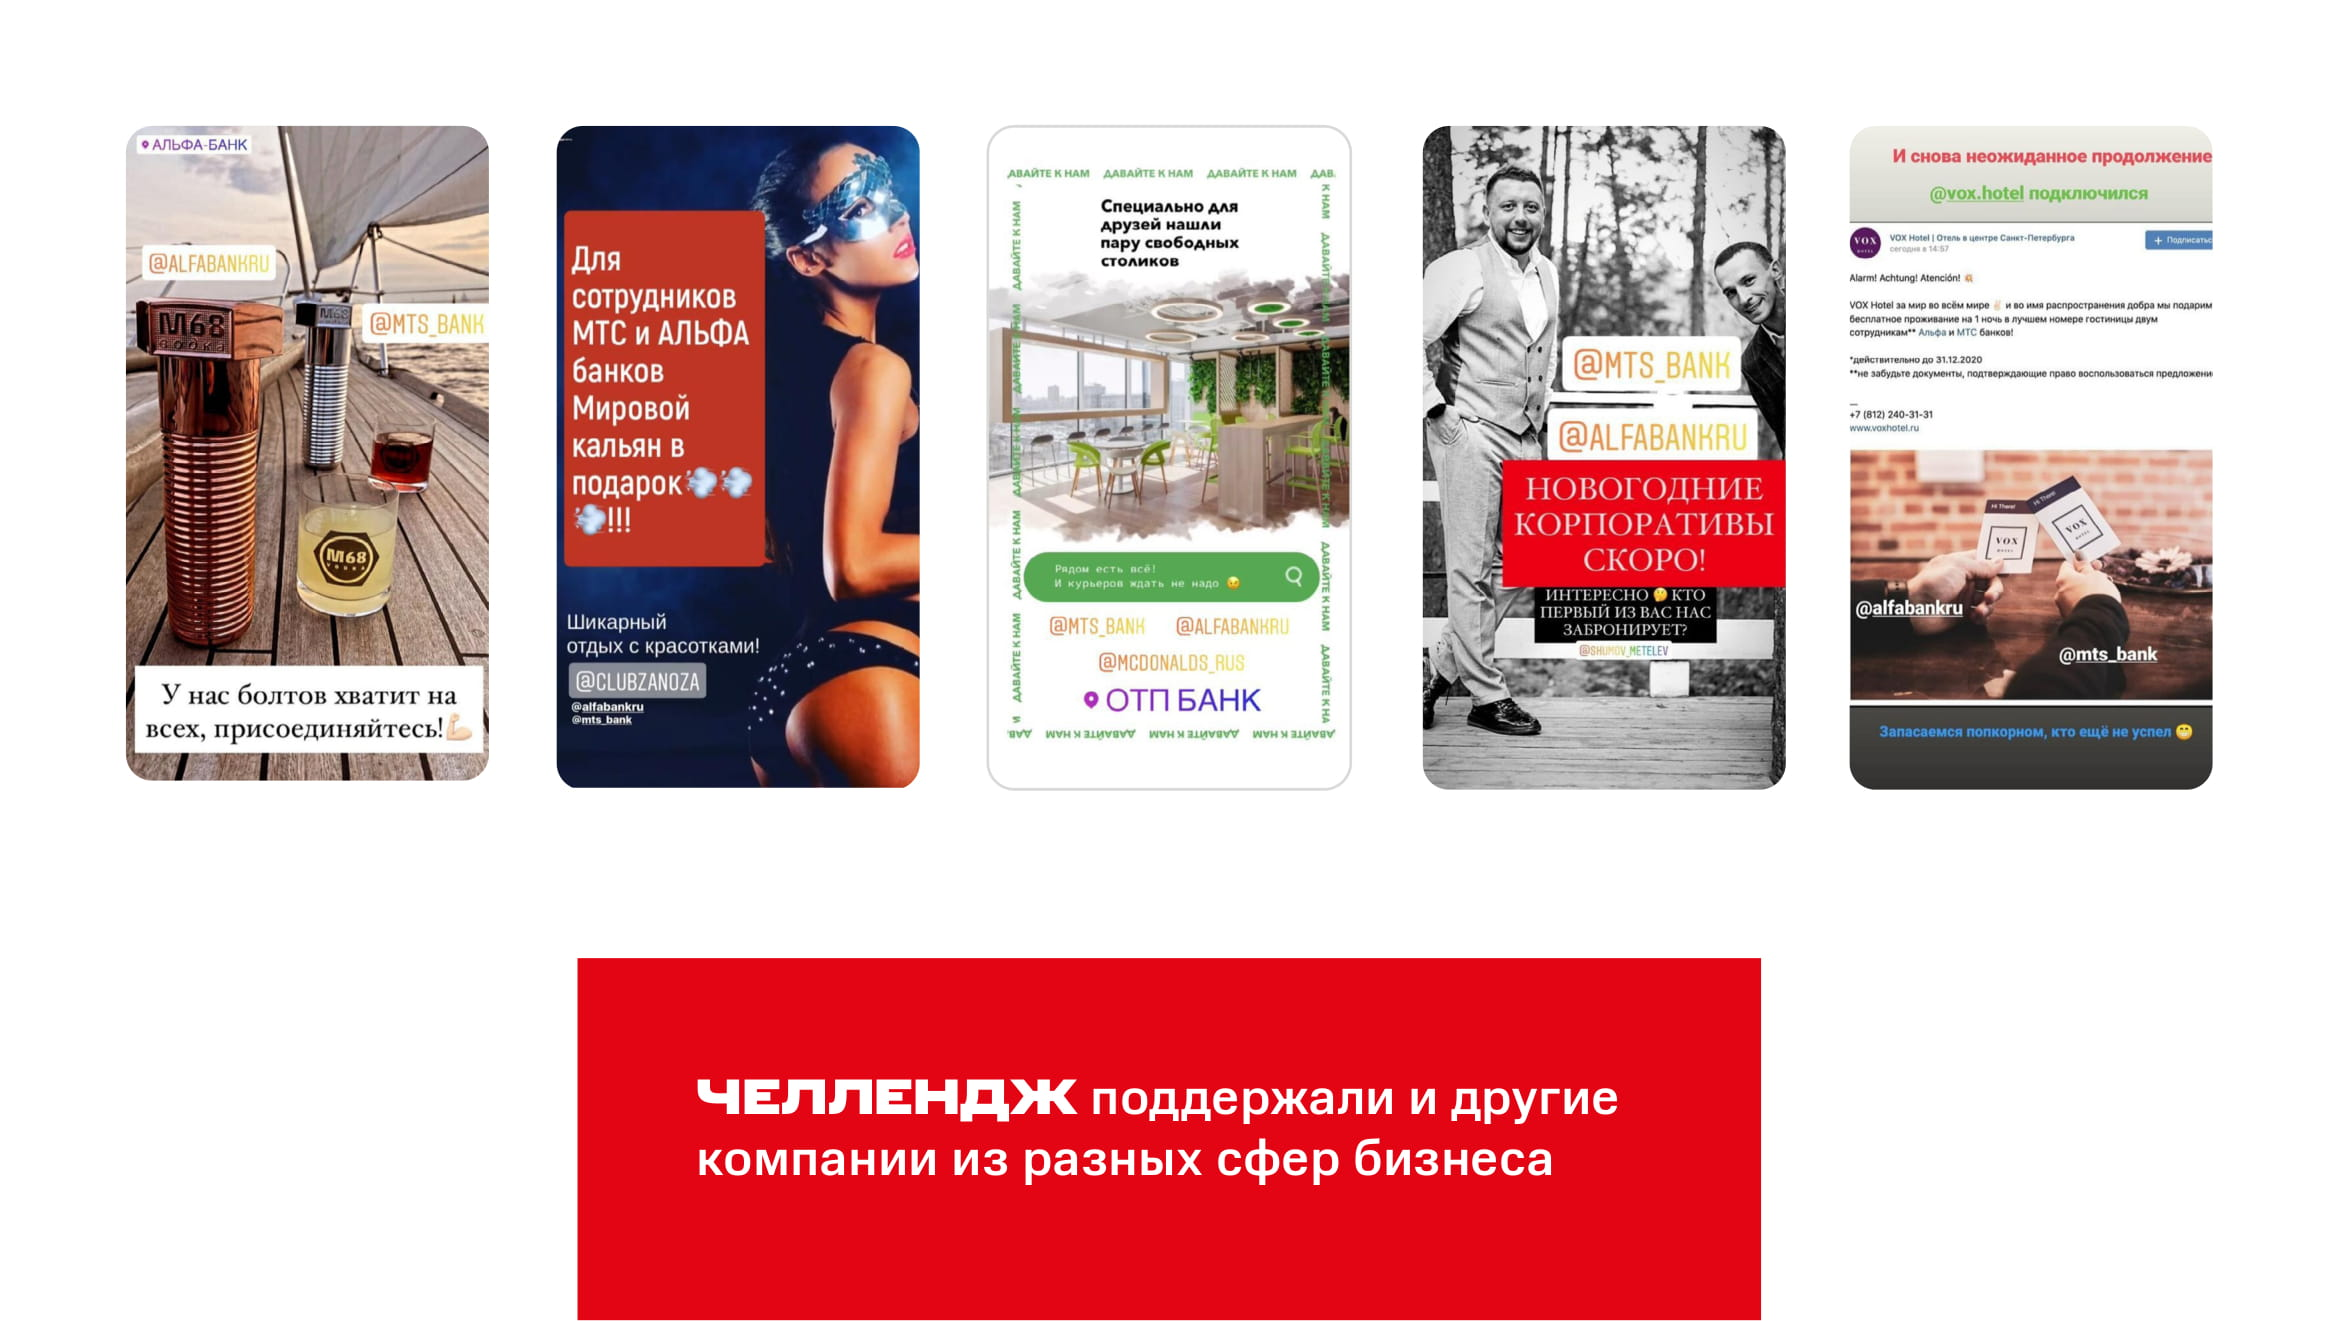 RFA_Креатив-года-2020_МТС-Банк-VS-Альфа-Банк-09